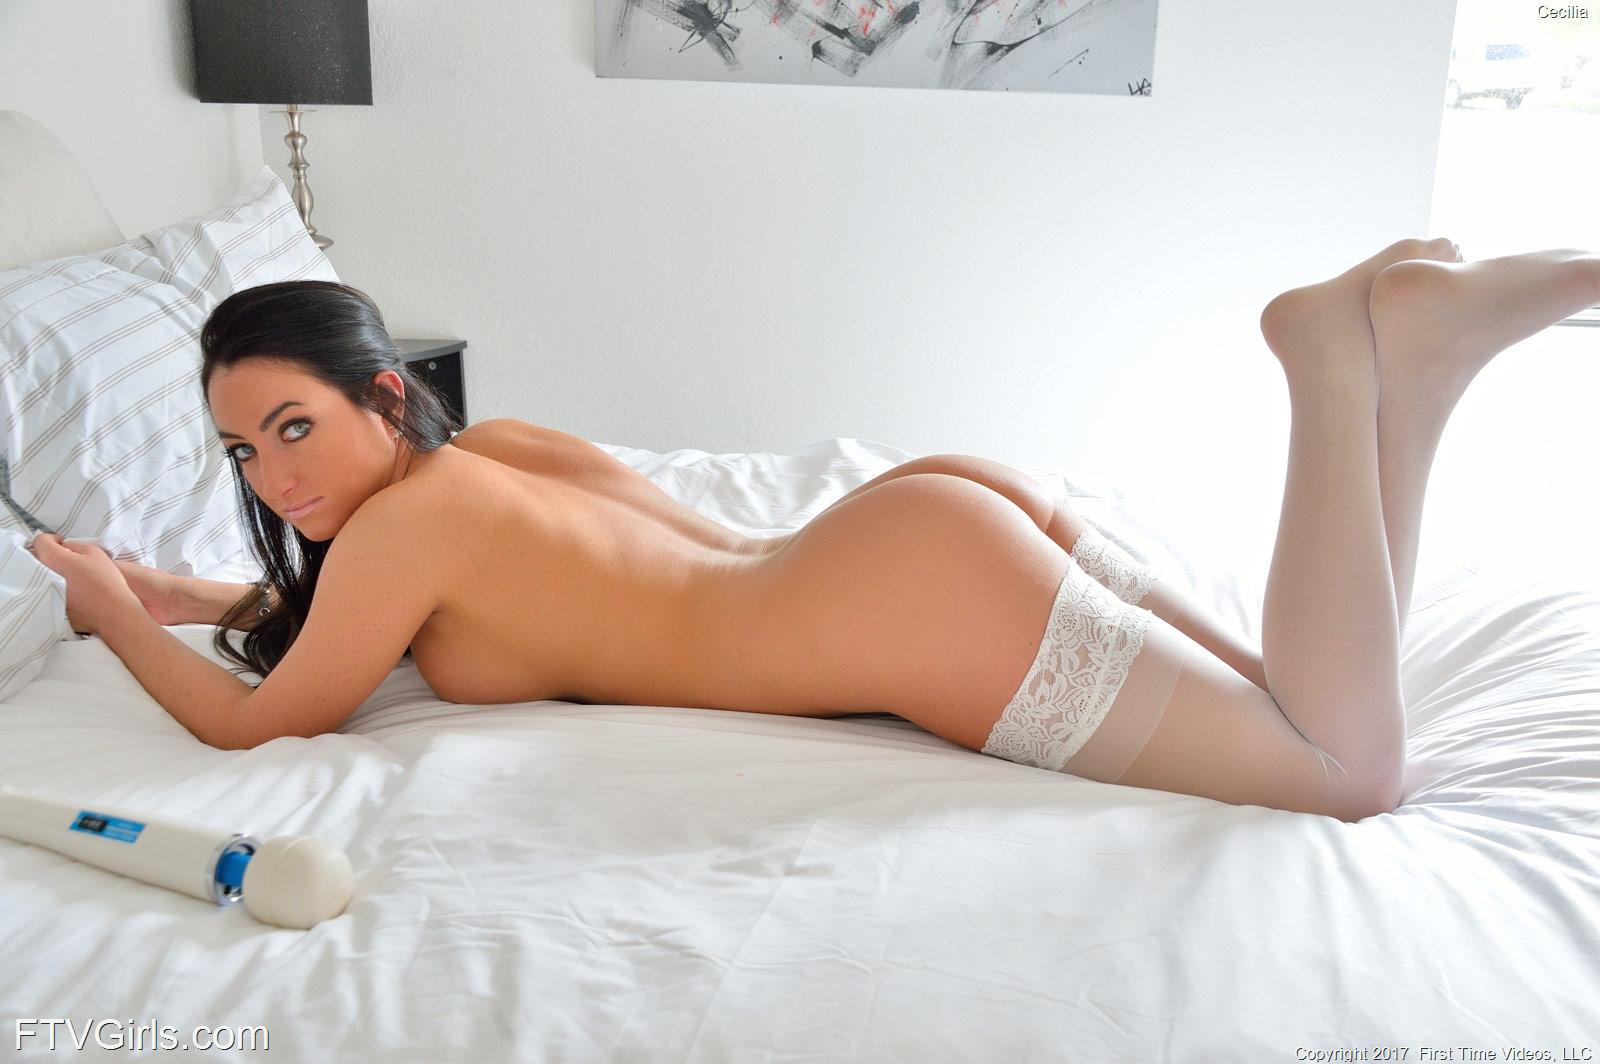 Patom girls sexy photos